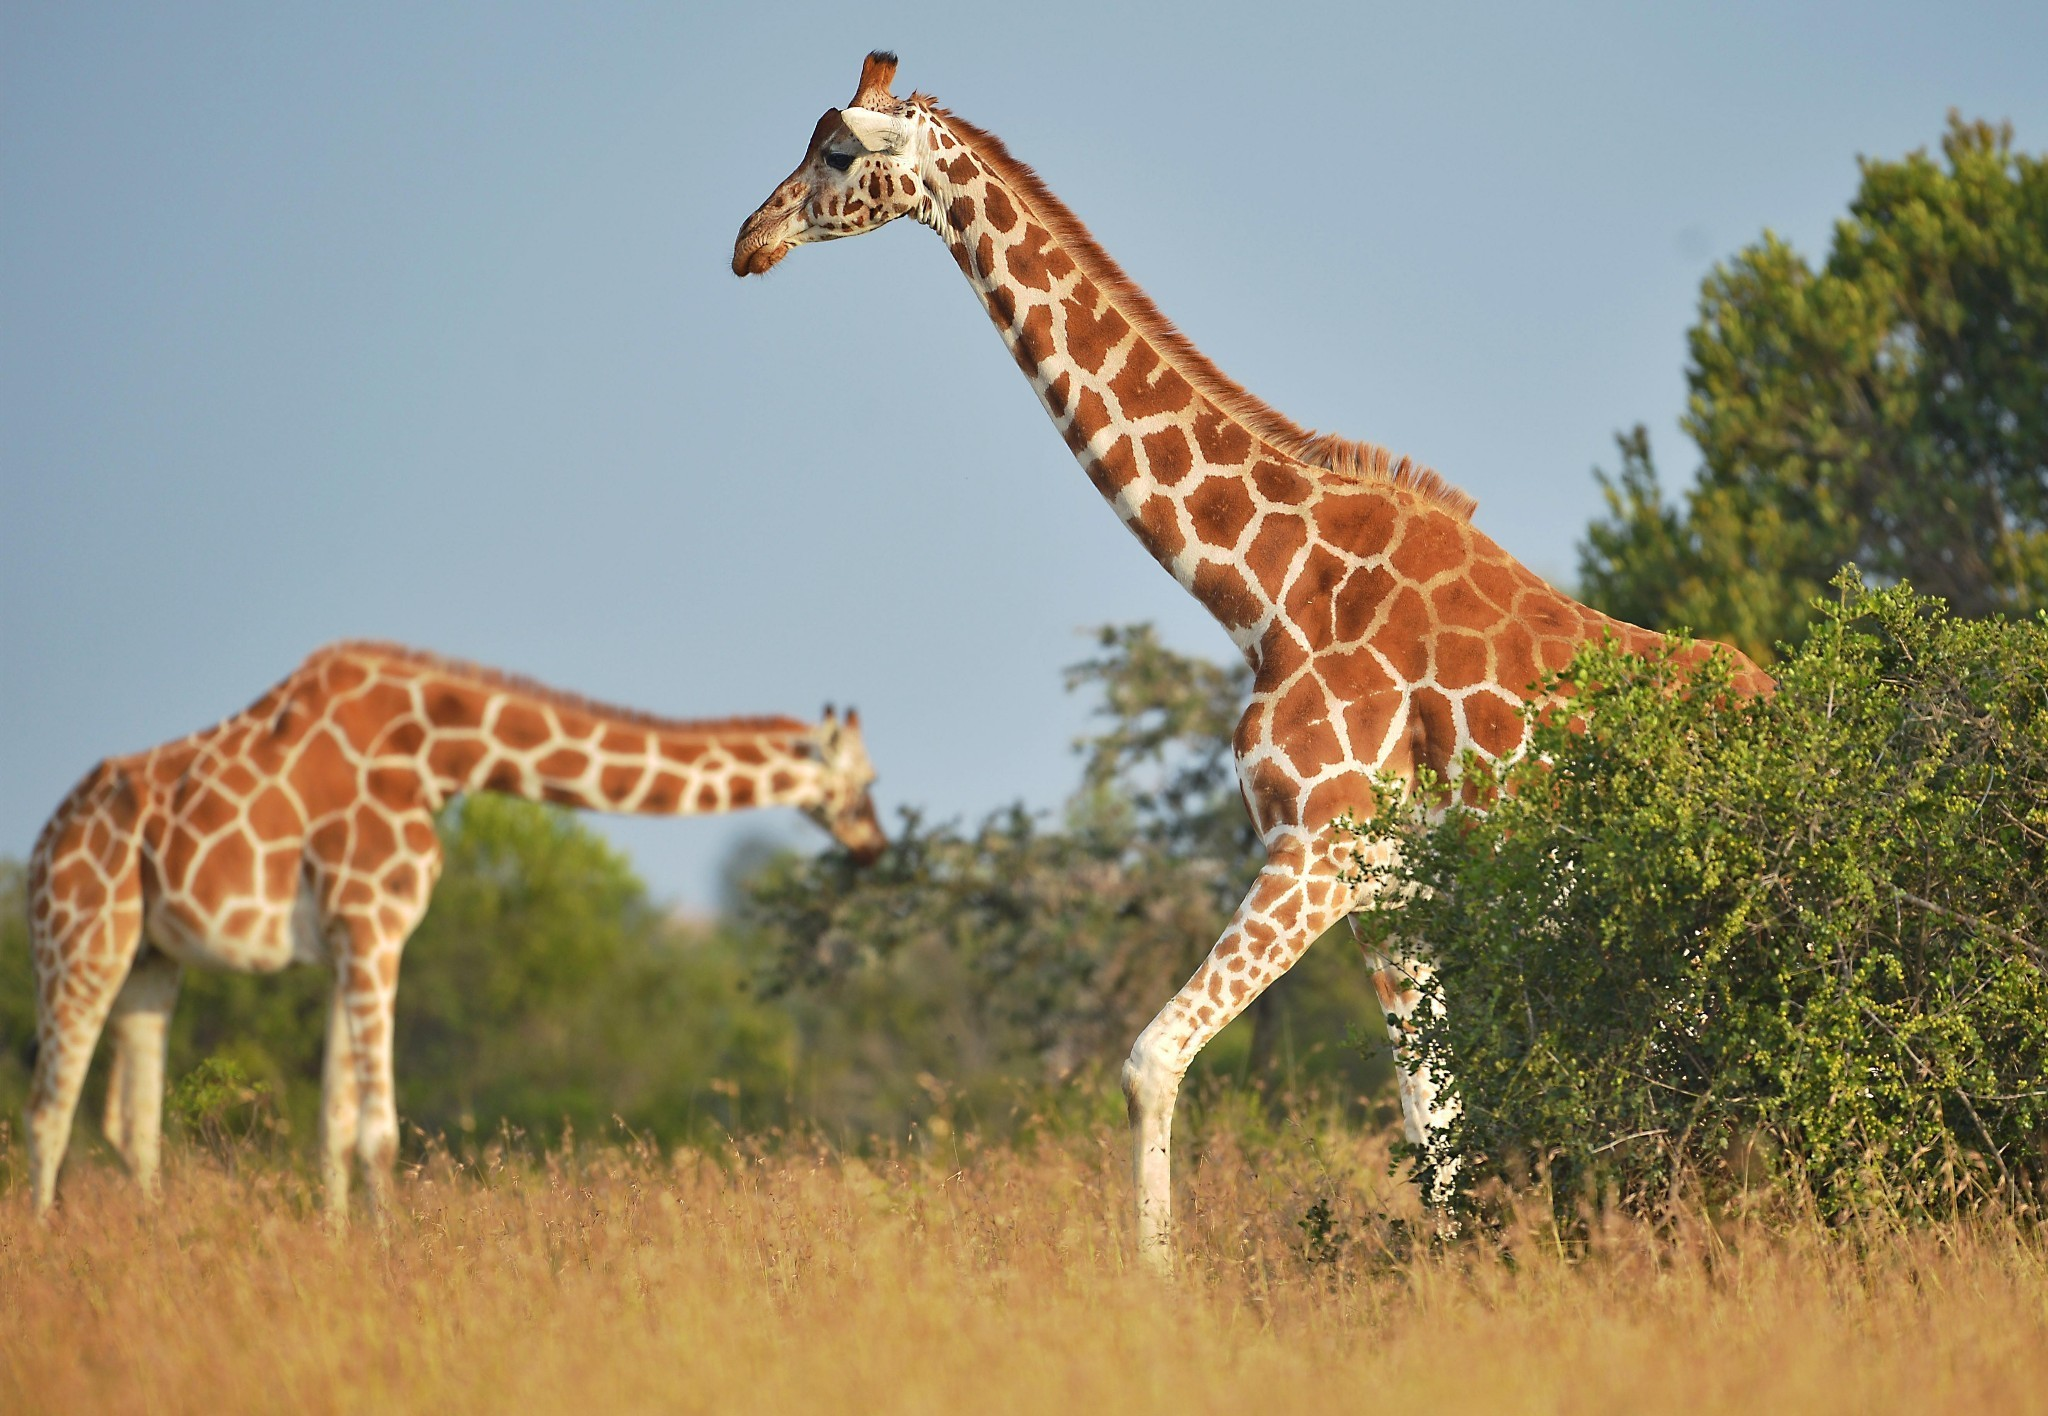 Giraffe facing extinction after devastating decline, experts warn